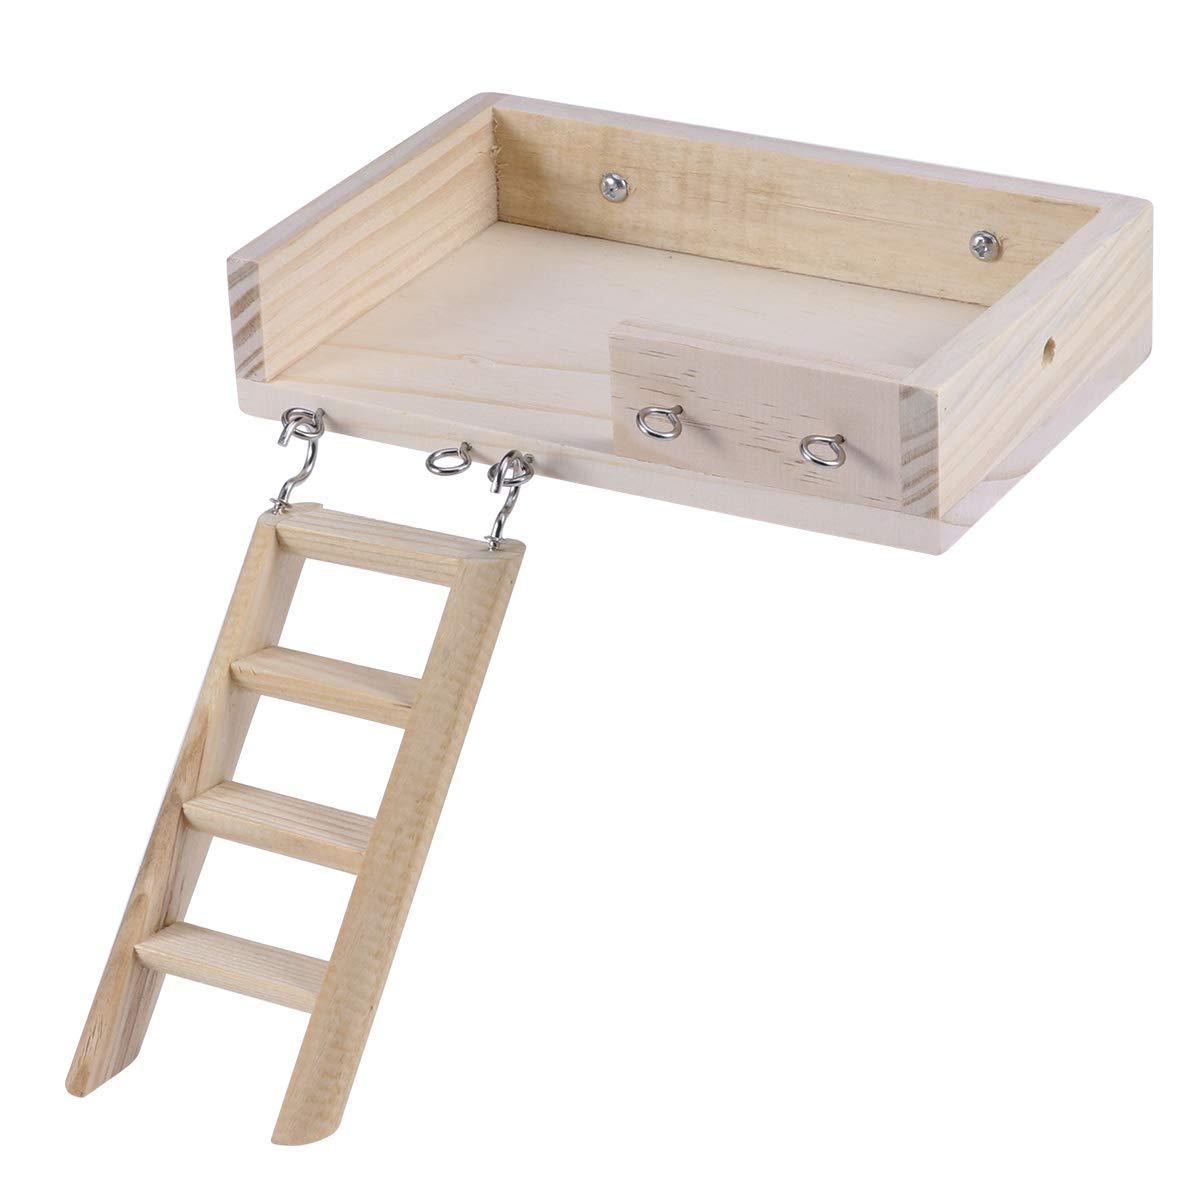 POPETPOP 2pcs Small Animal Wooden Platform Wooden Hamster Toy Crawling Ladder Set for Small pet (Ladder + Platform) by POPETPOP